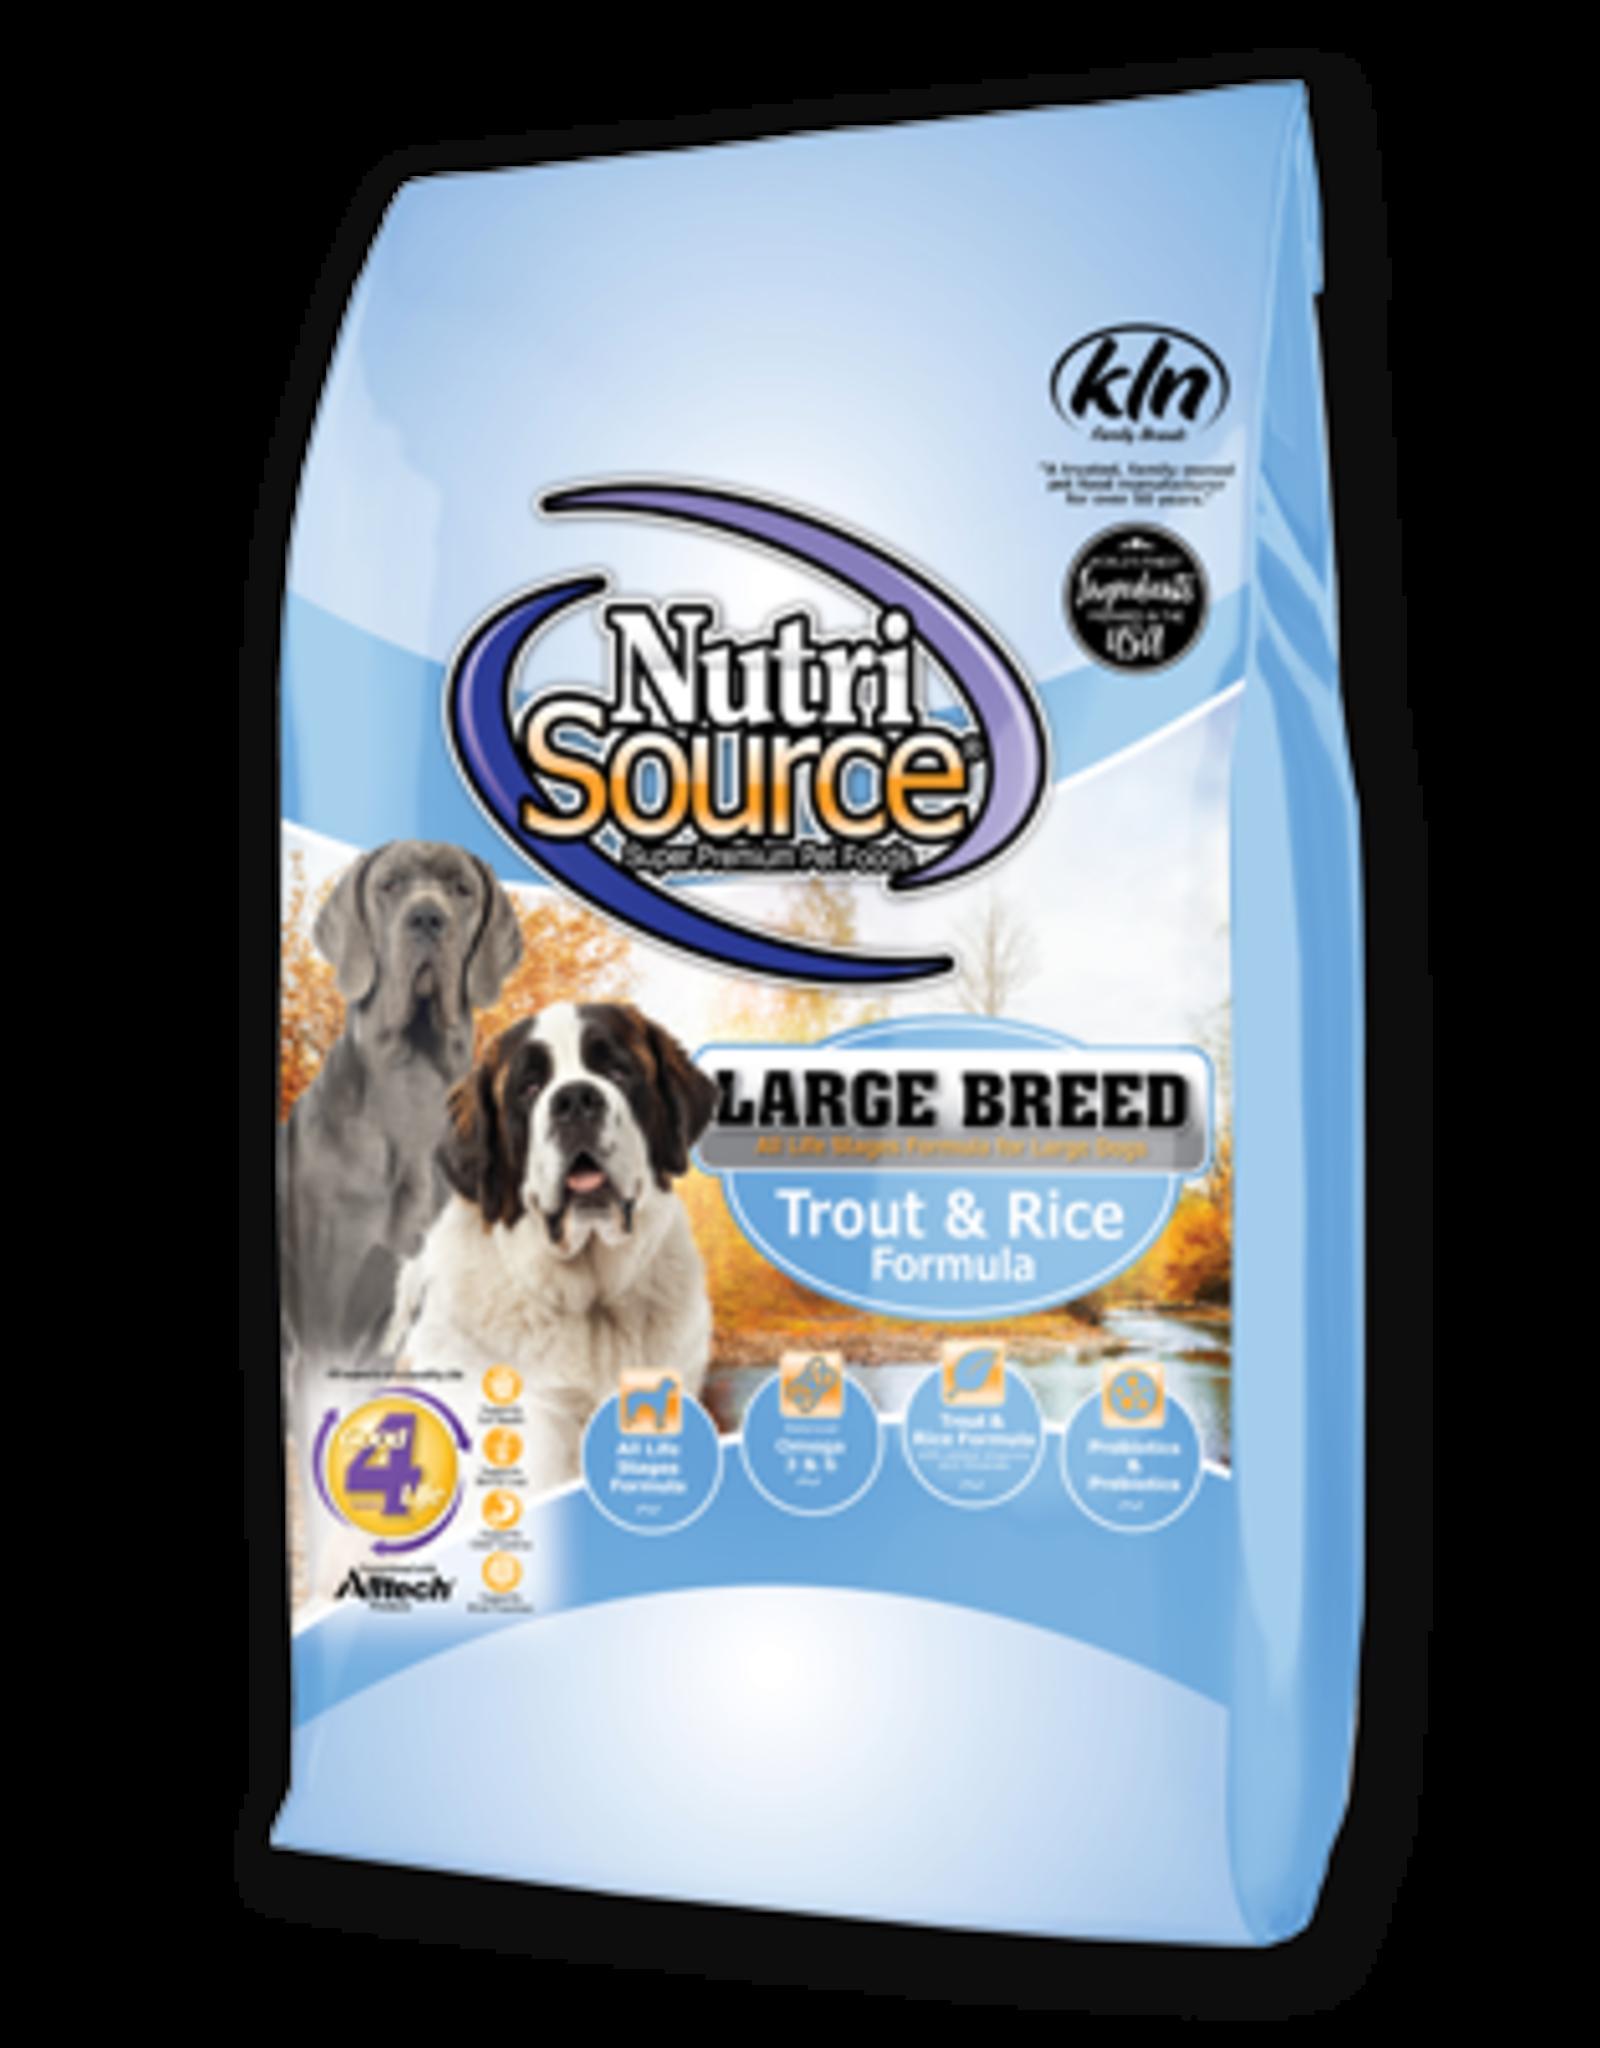 KLN NutriSource: Large Breed